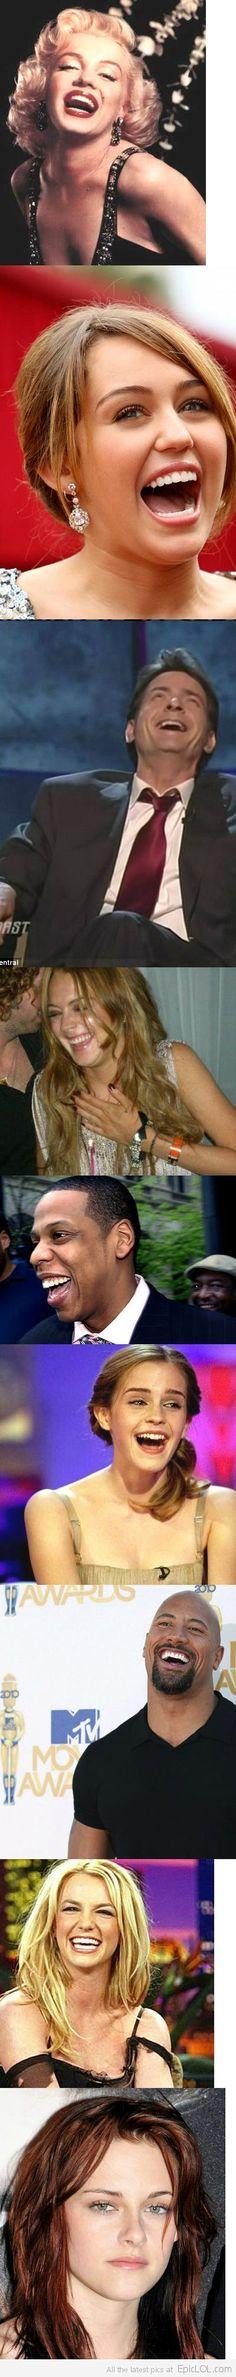 How celebrities laugh...